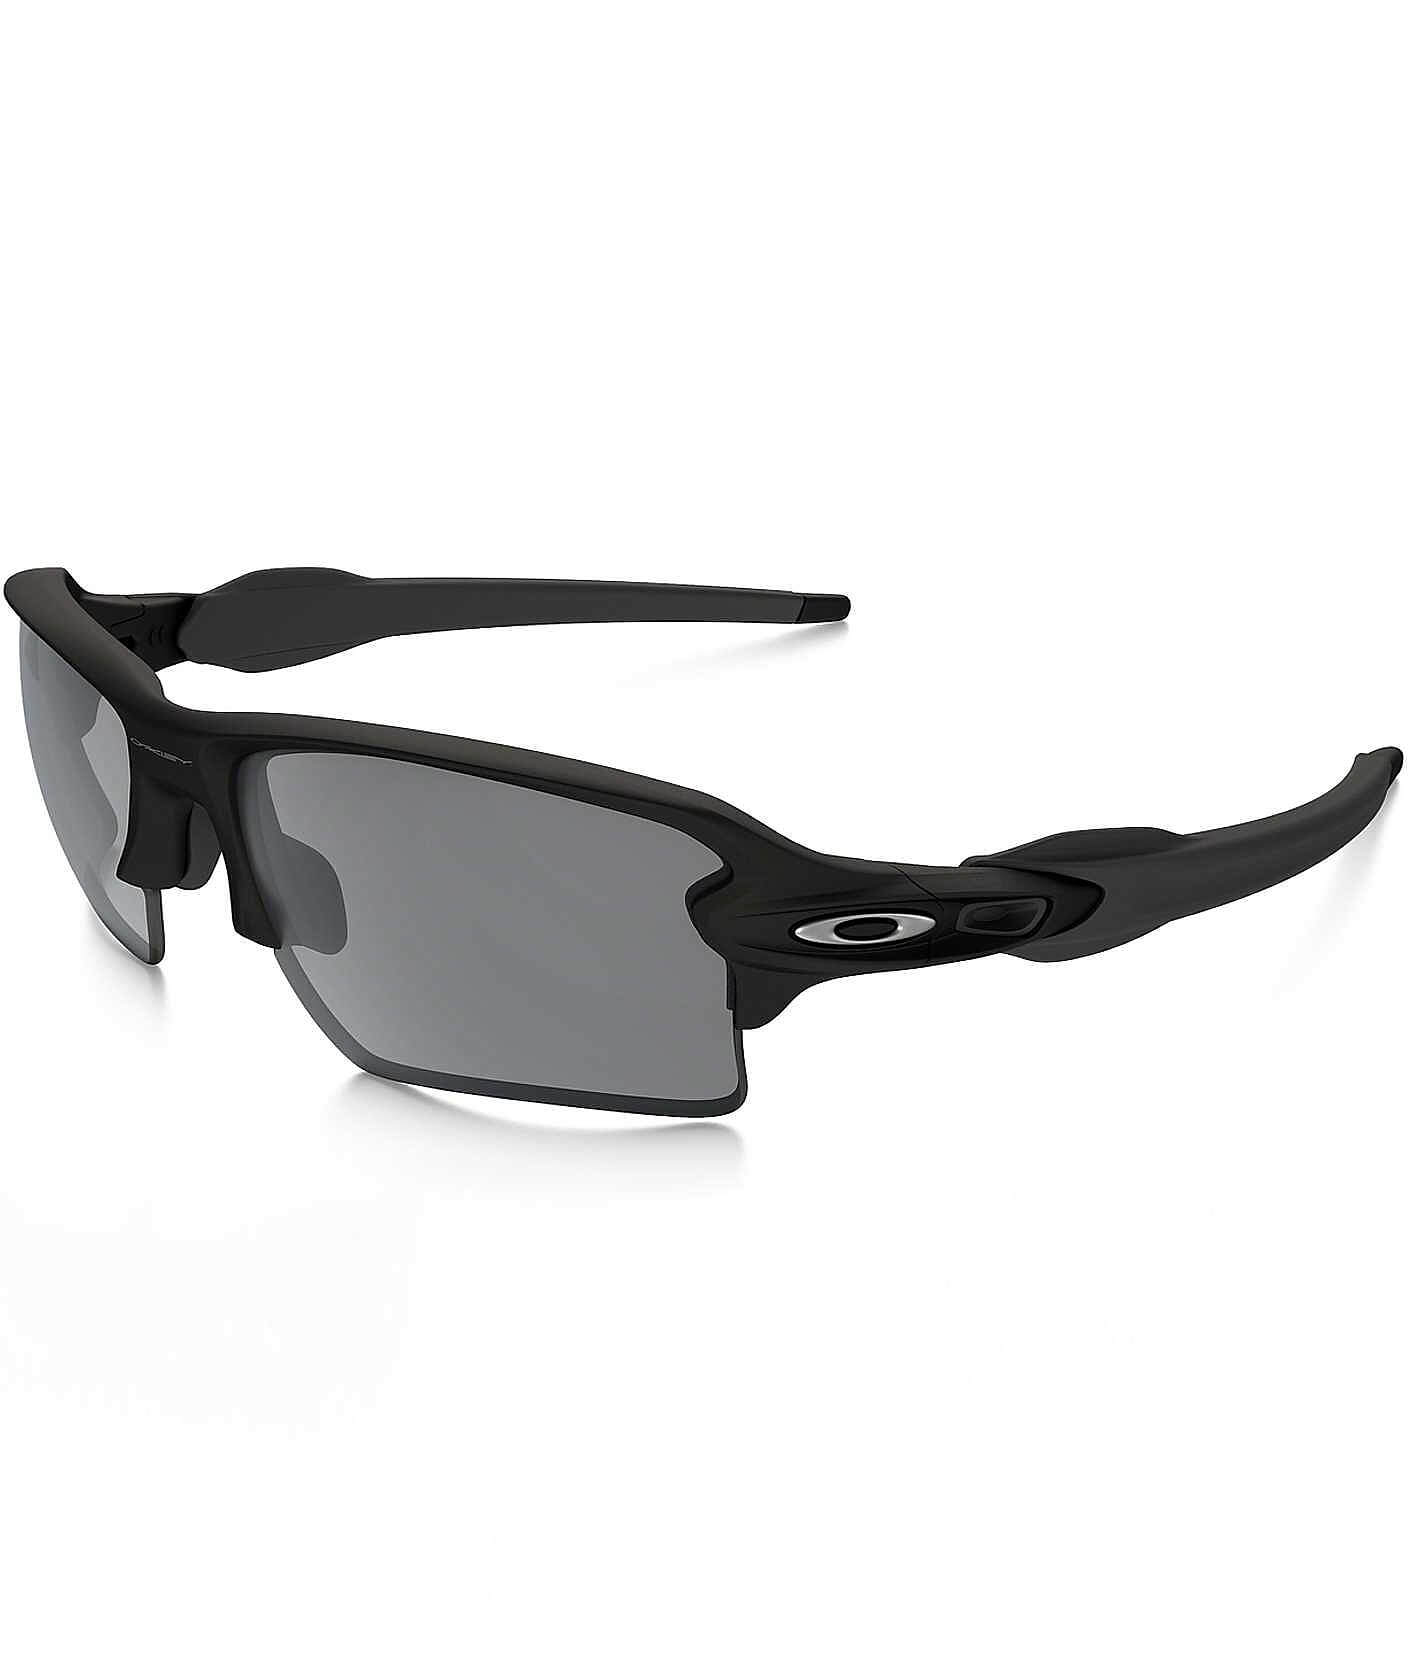 Oakley Flak 2.0 Sunglasses | Tuggl